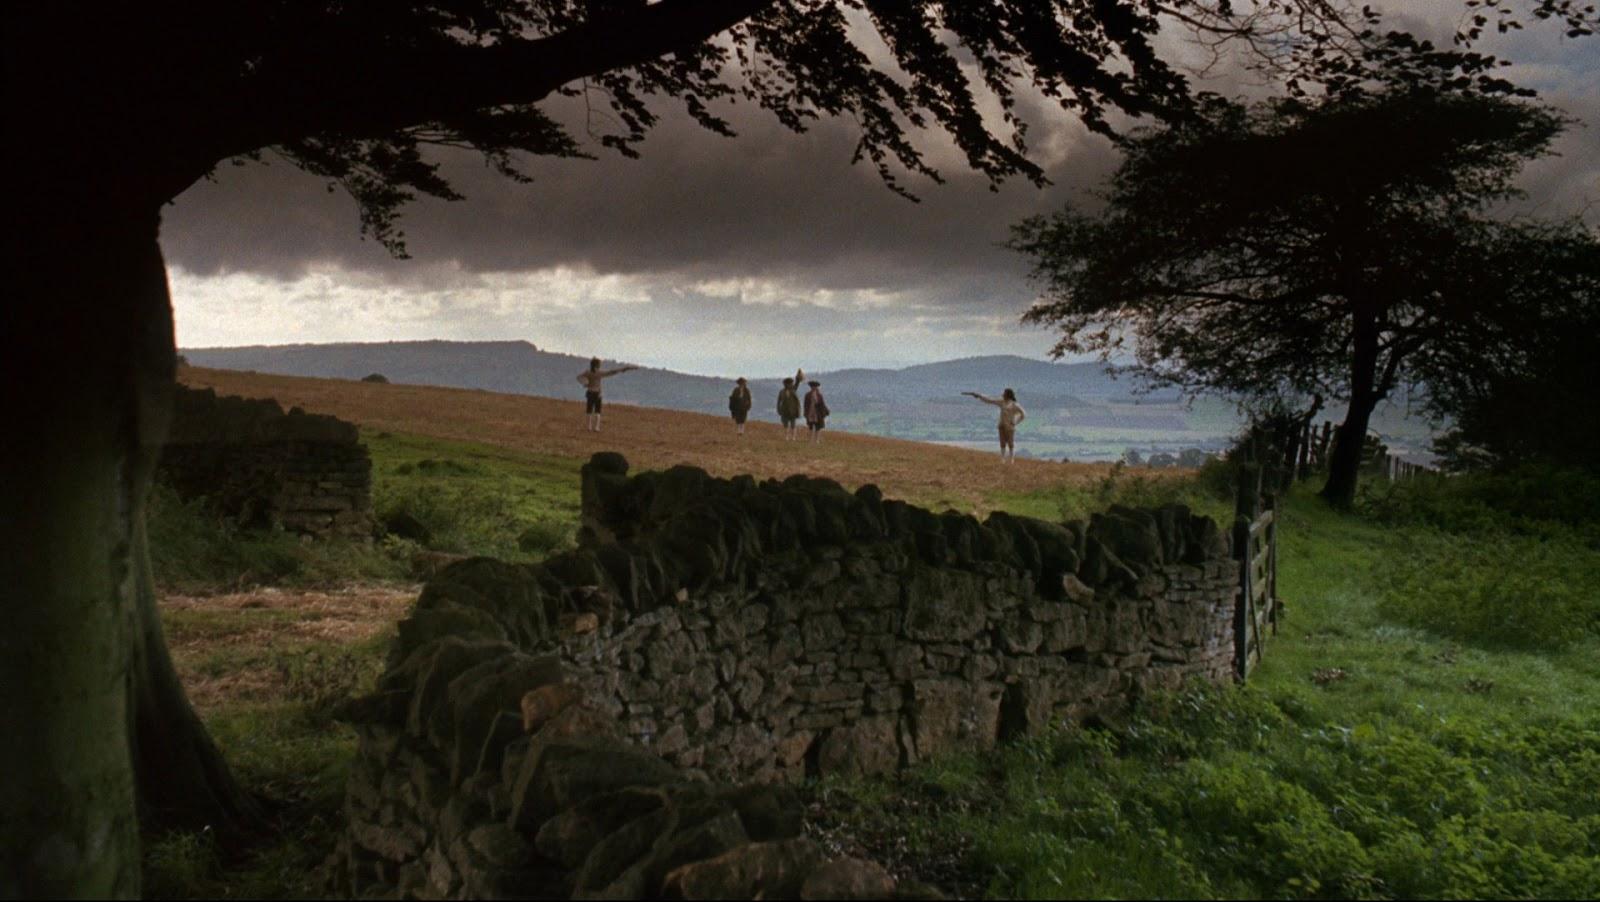 """Barry Lyndon"" (1975) Dir: Stanley Kubrick DP: John Alcott, BSC"